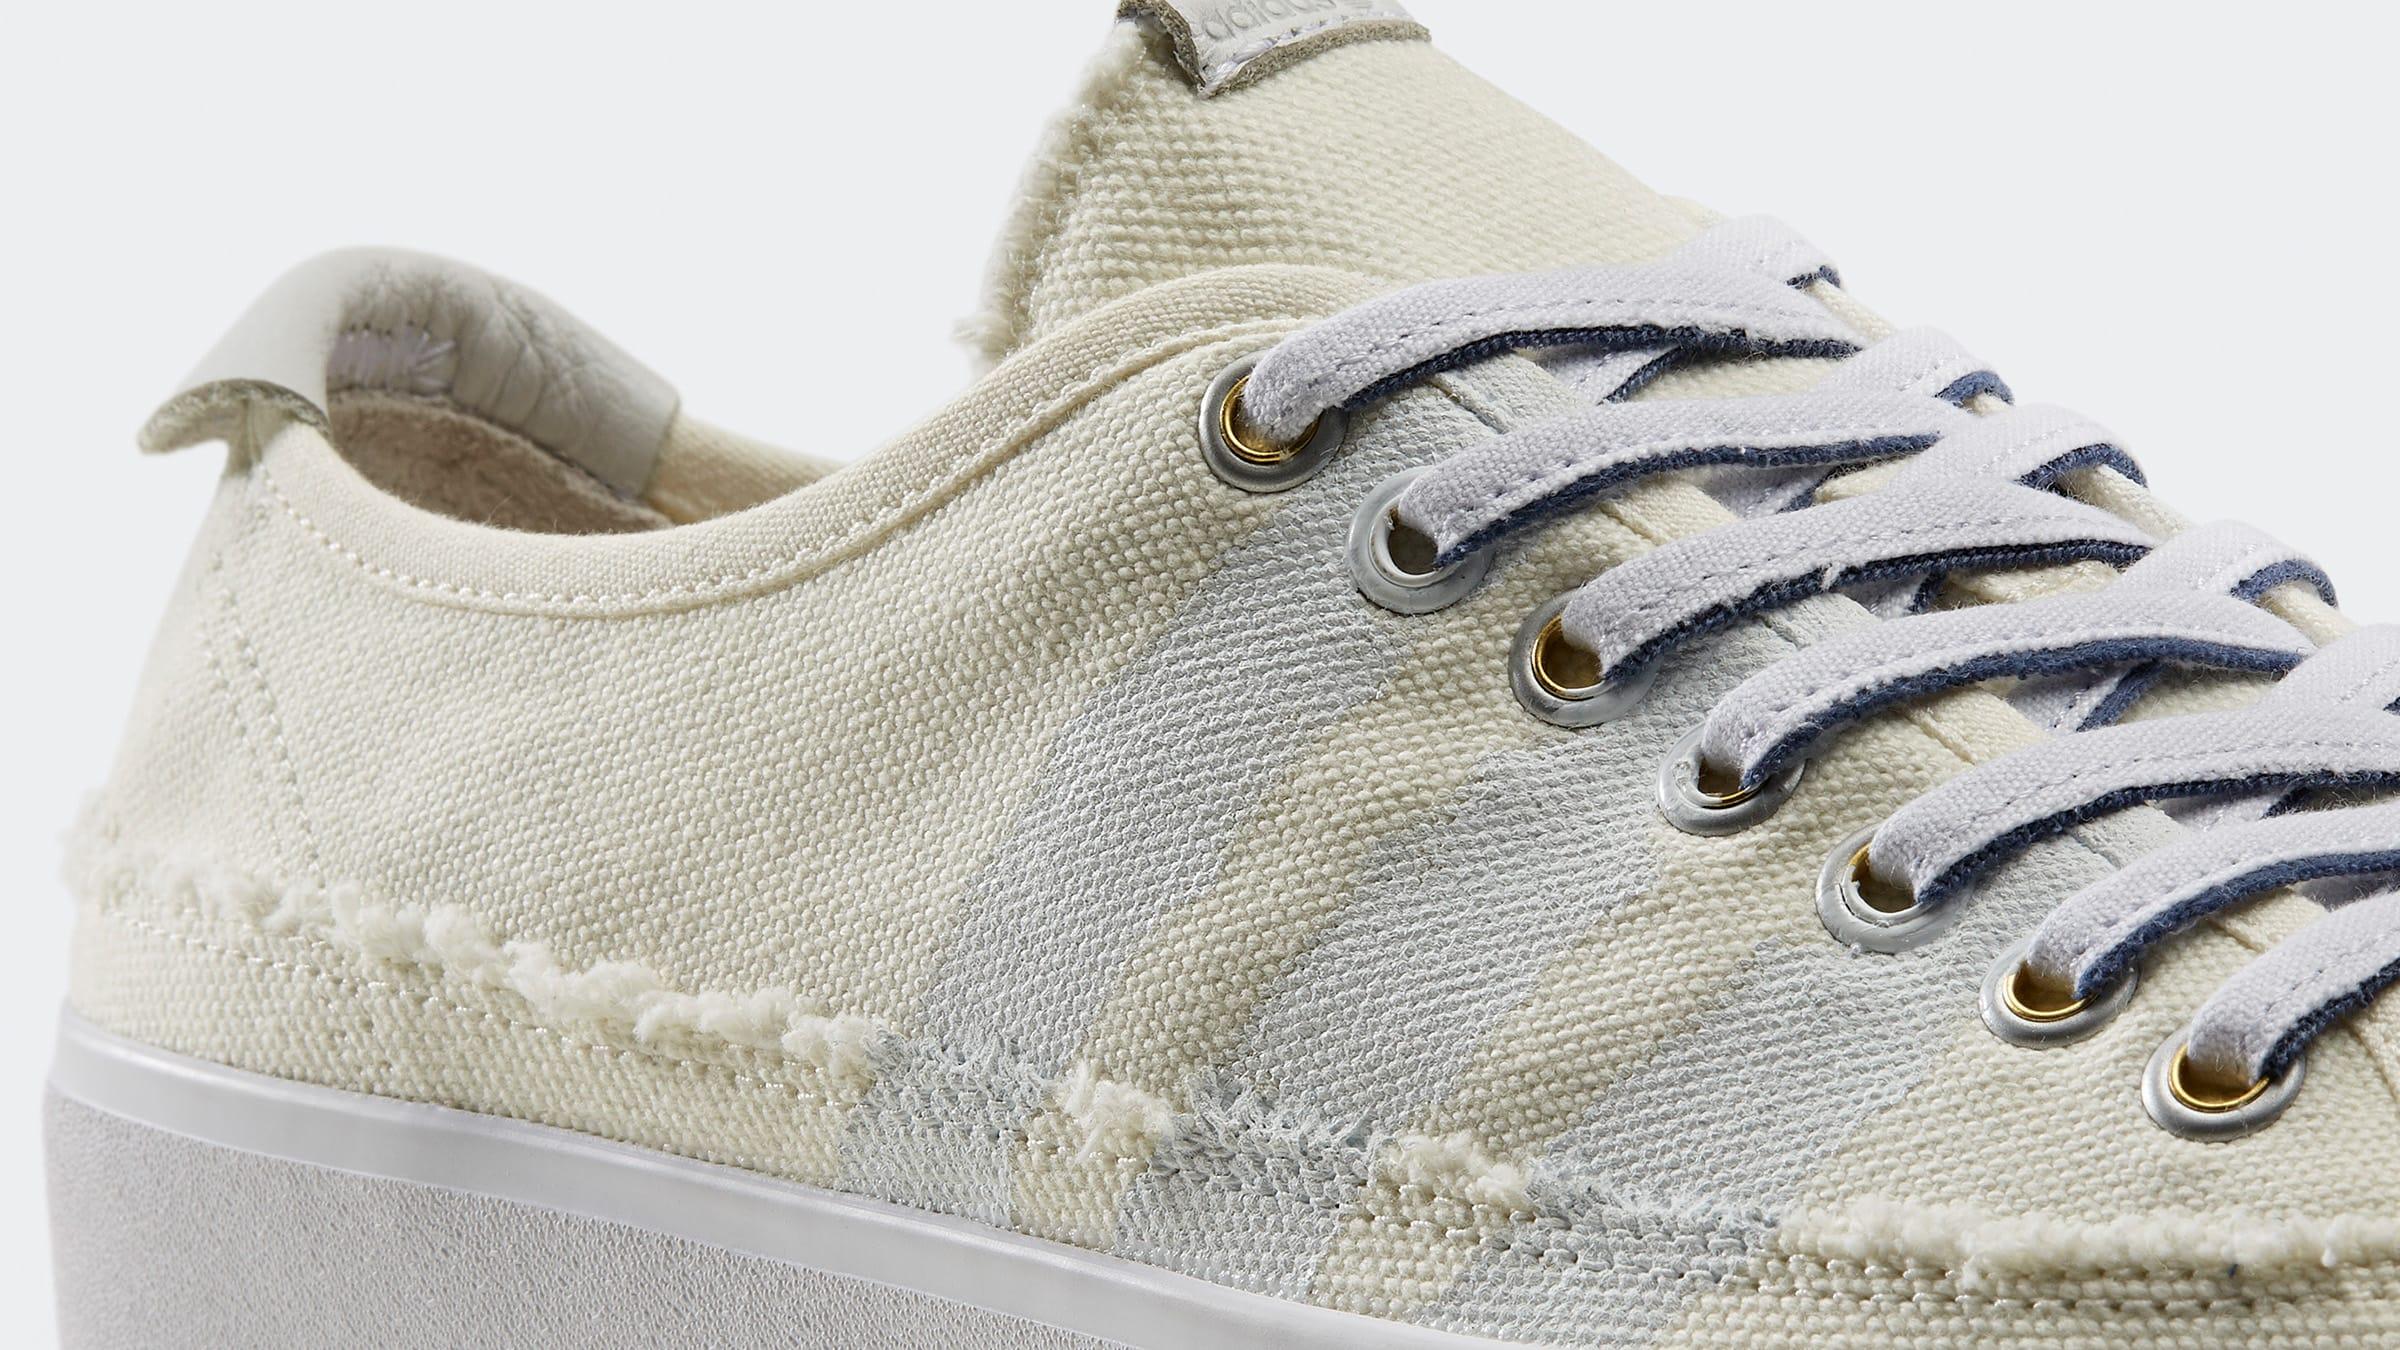 Adidas x Donald Glover NIzza (Off White